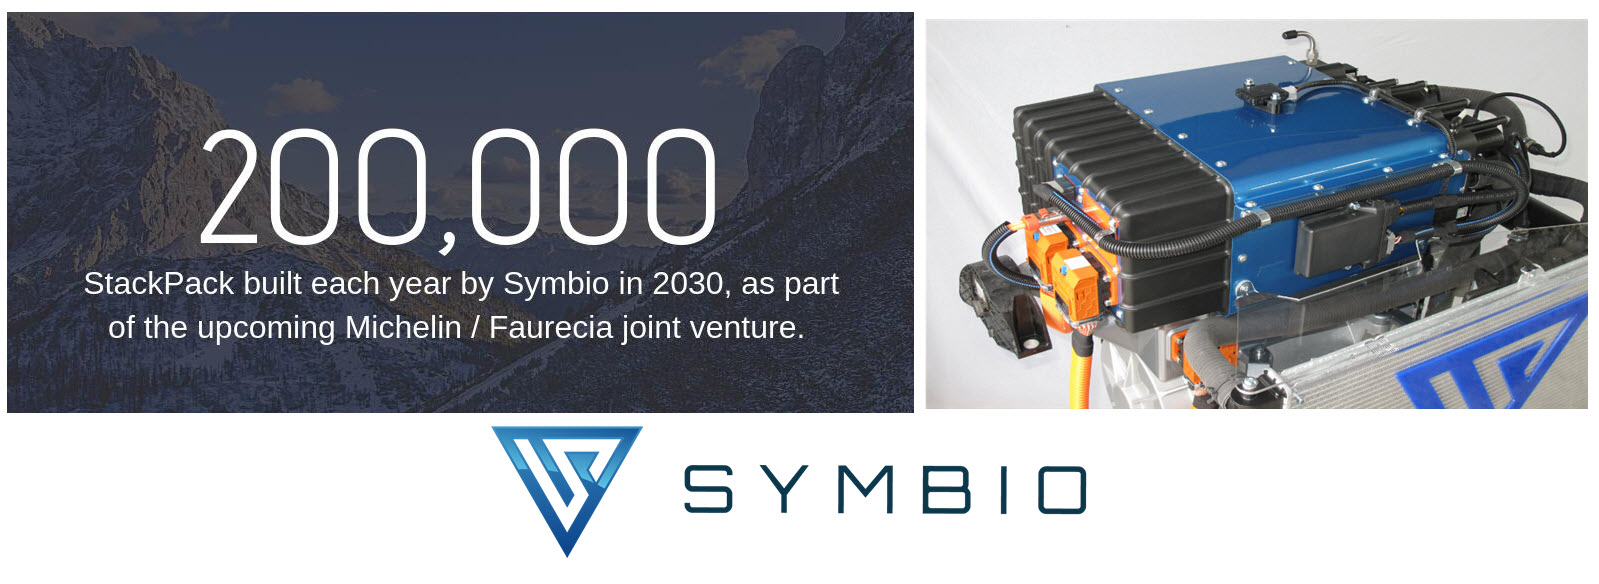 Symbio Stack Pack Predition Main